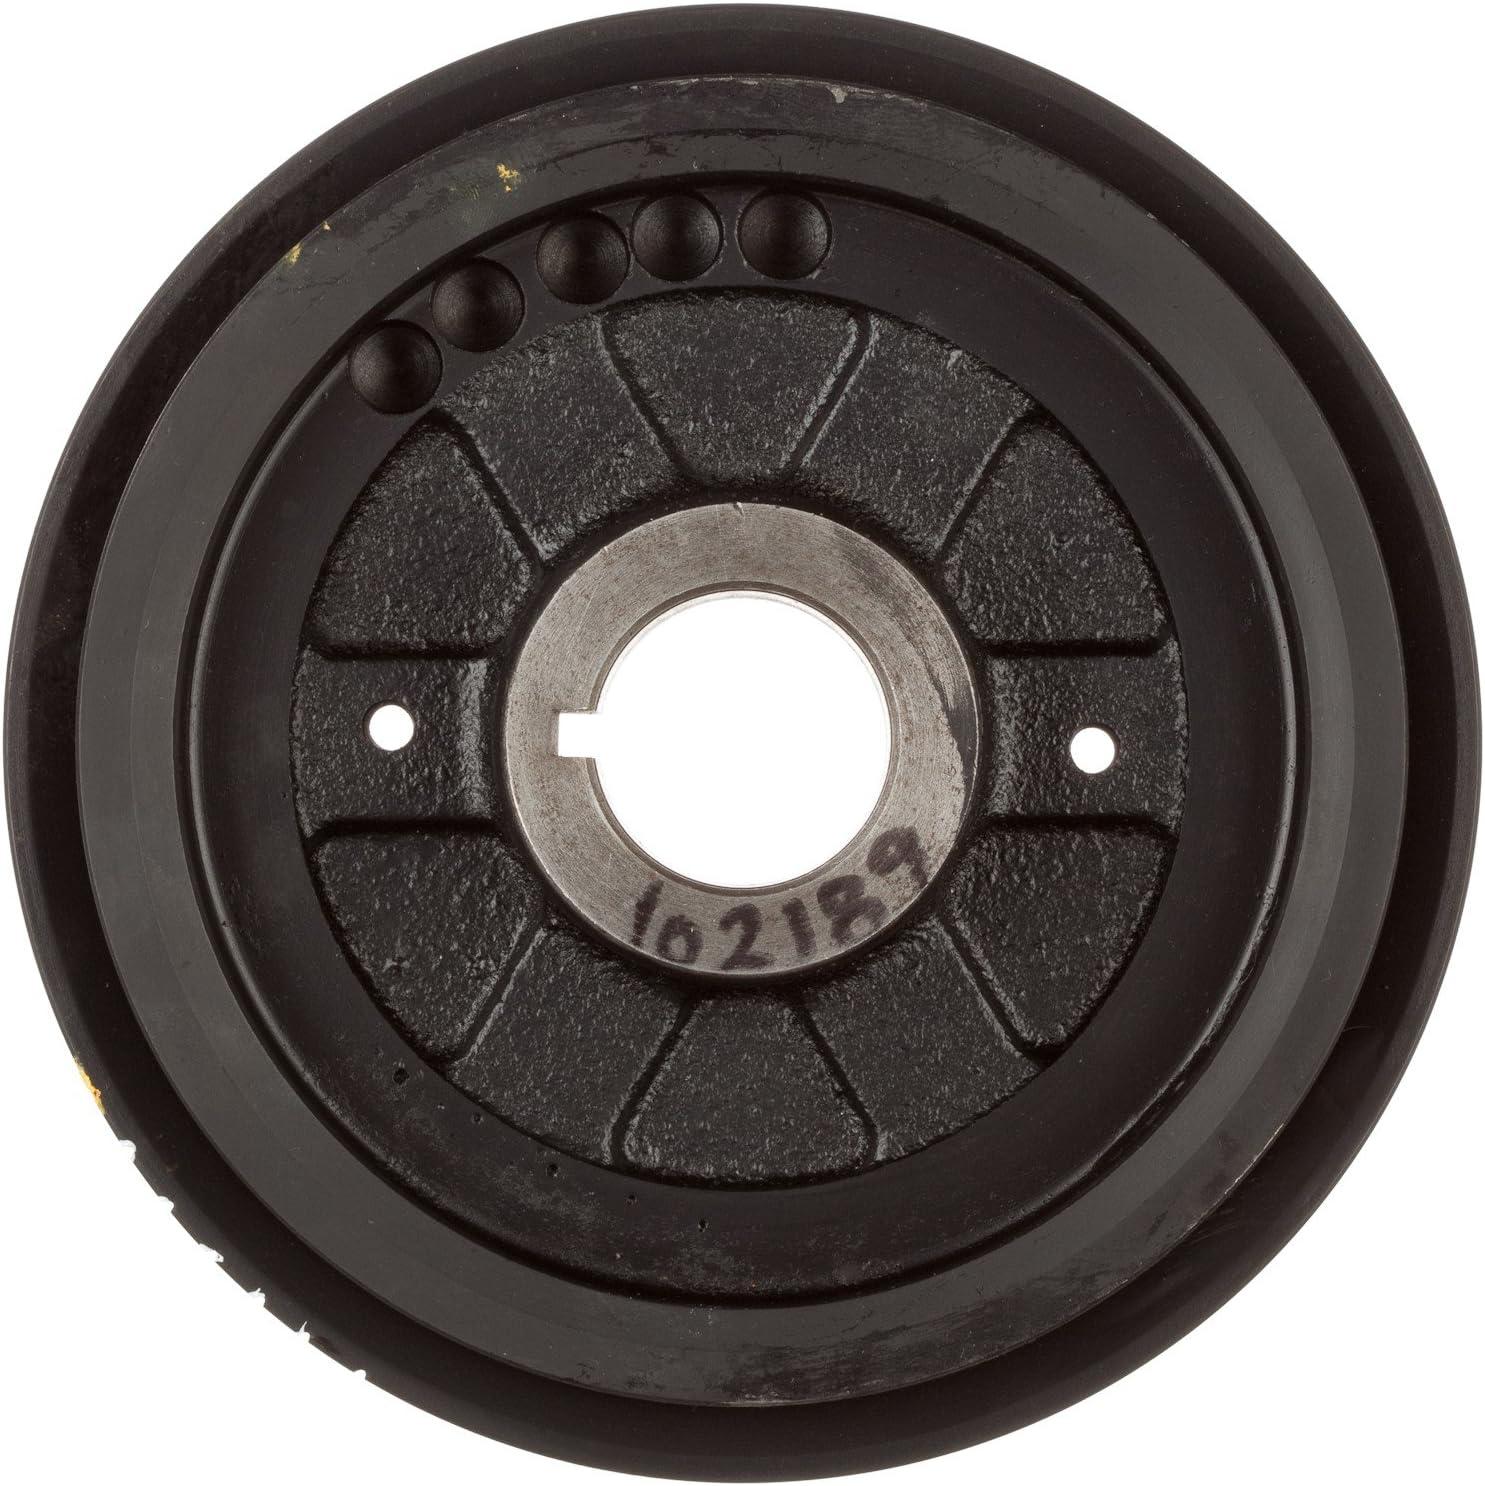 ATP Automotive Graywerks 102189 Engine Harmonic Balancer